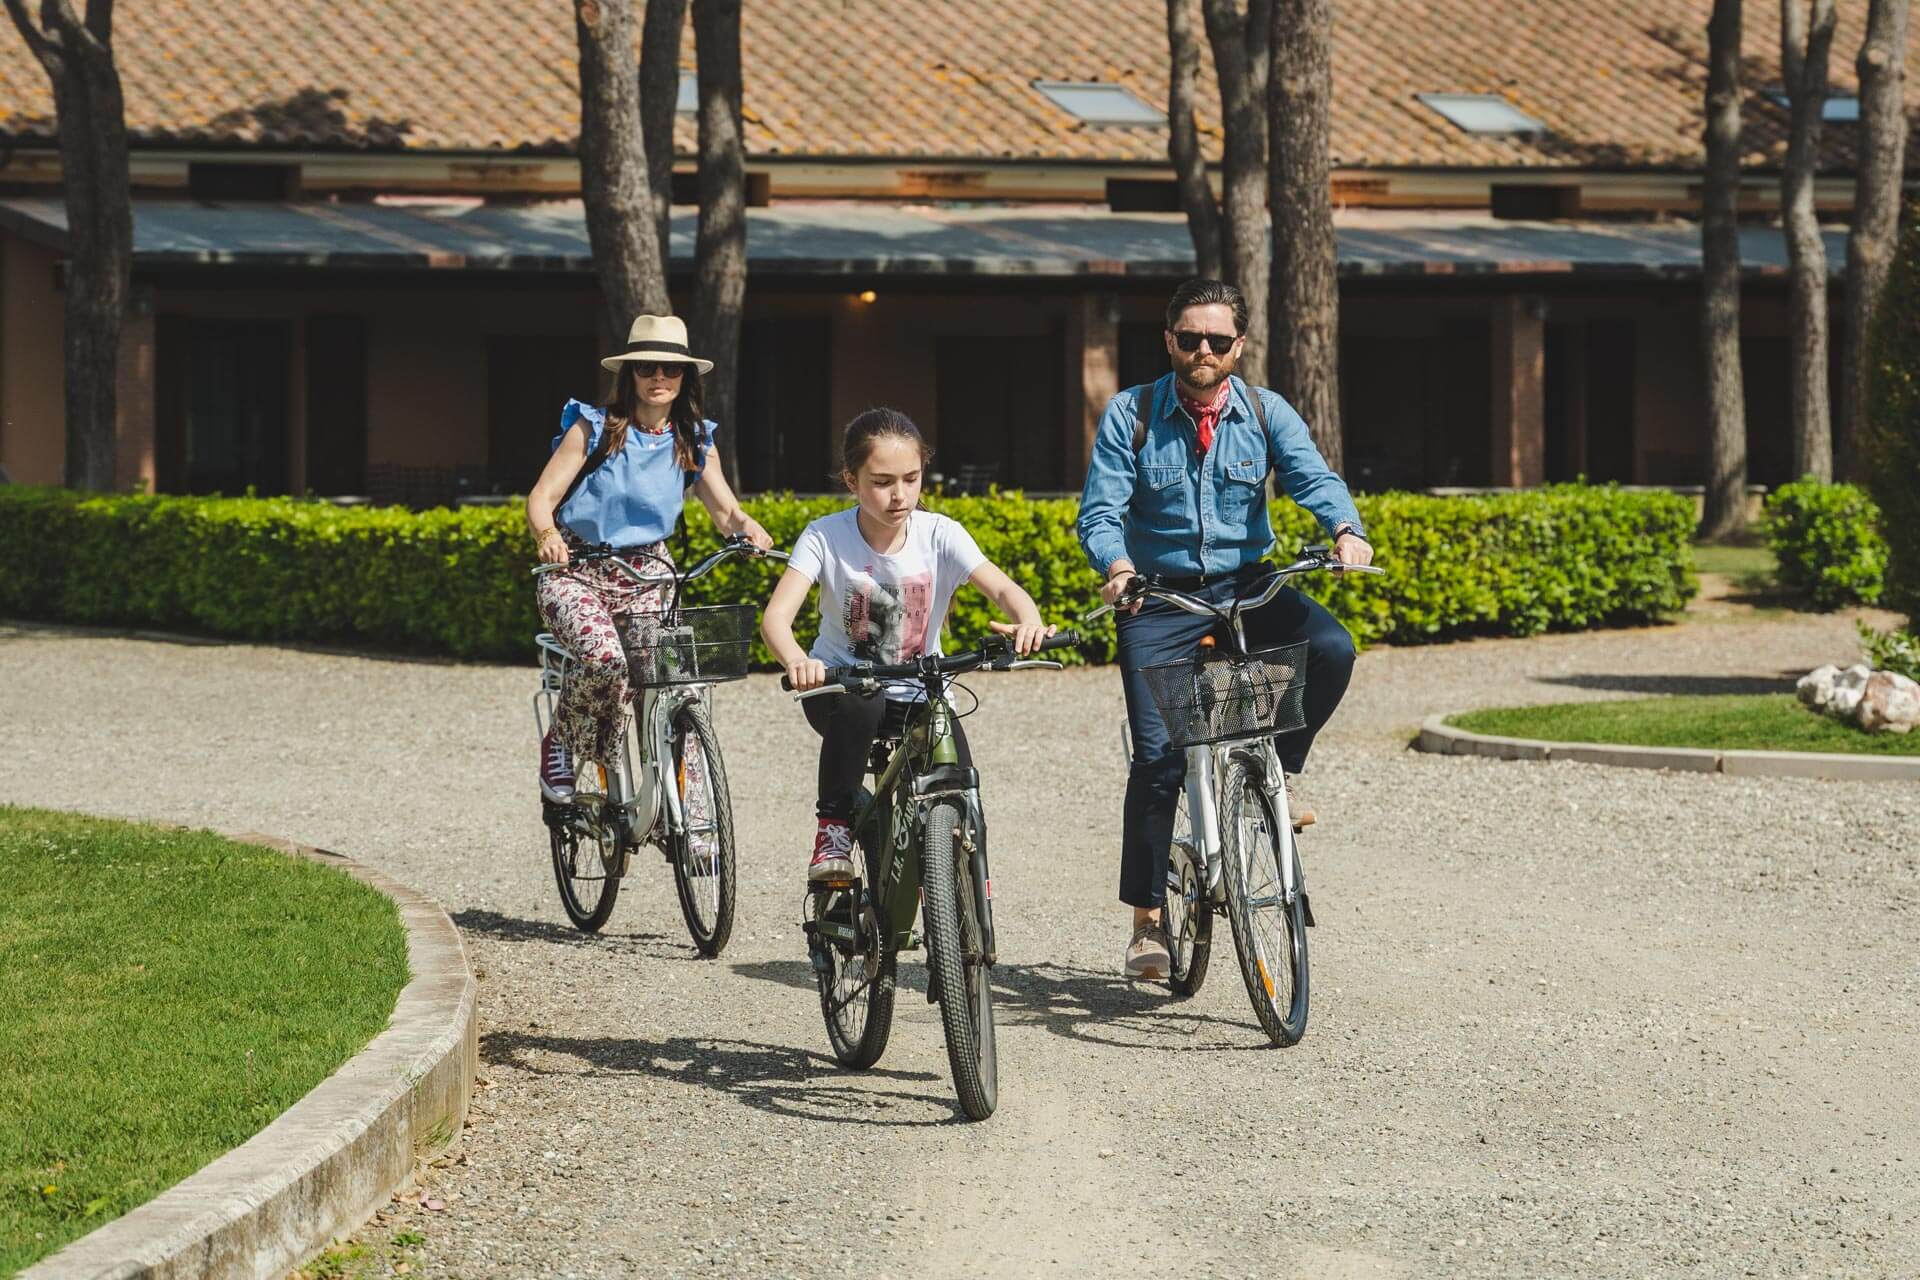 noleggio e-bike maremma toscana